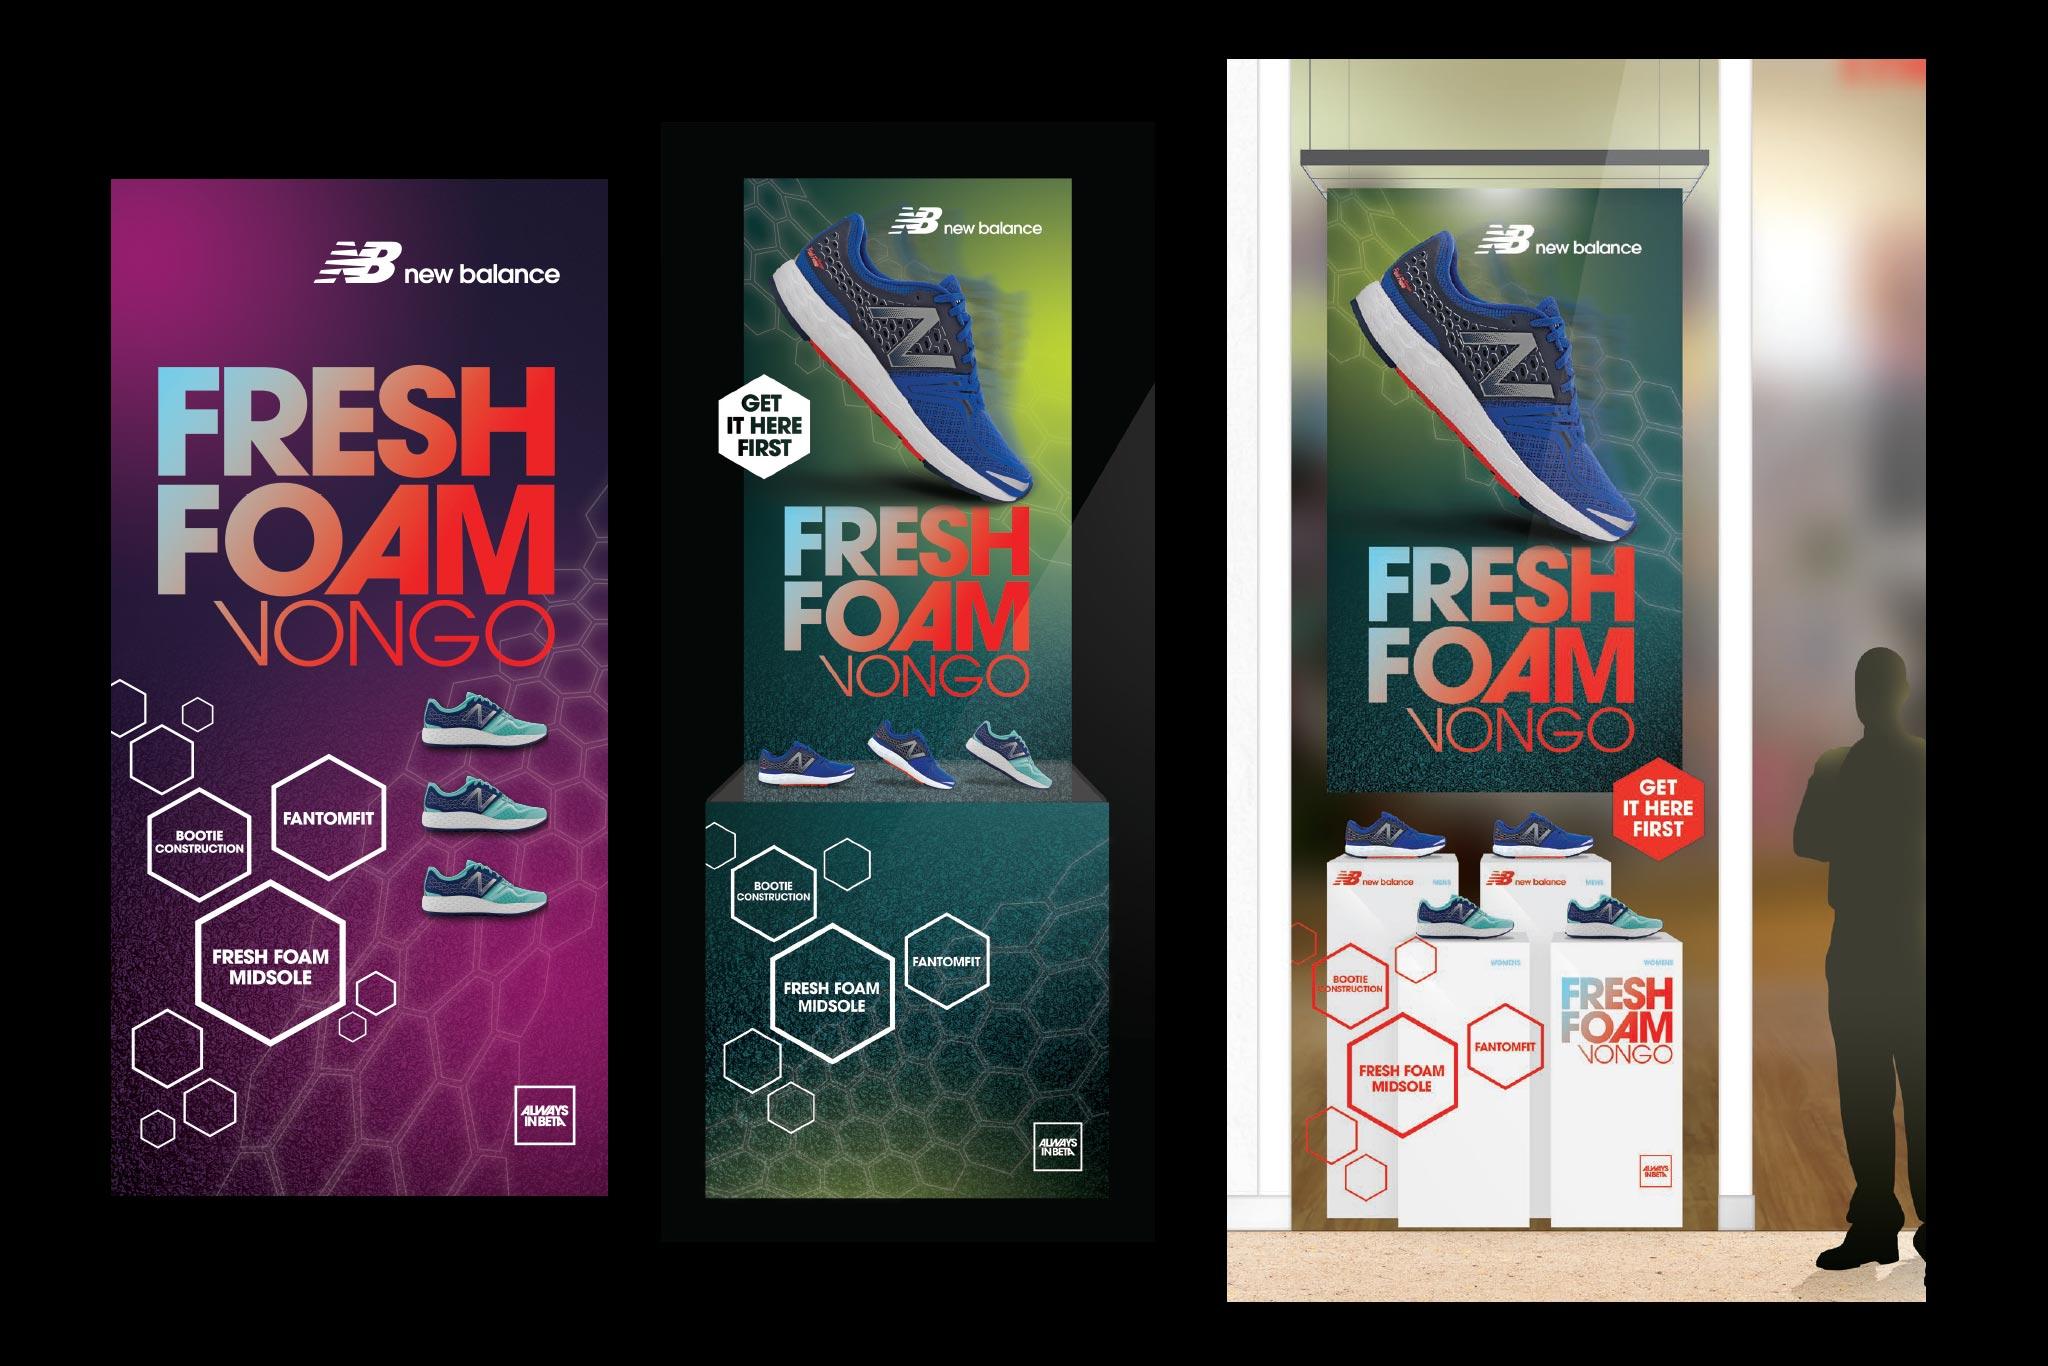 the-athletes-foot-gallery-2-new-balance-fresh-foam-vongo